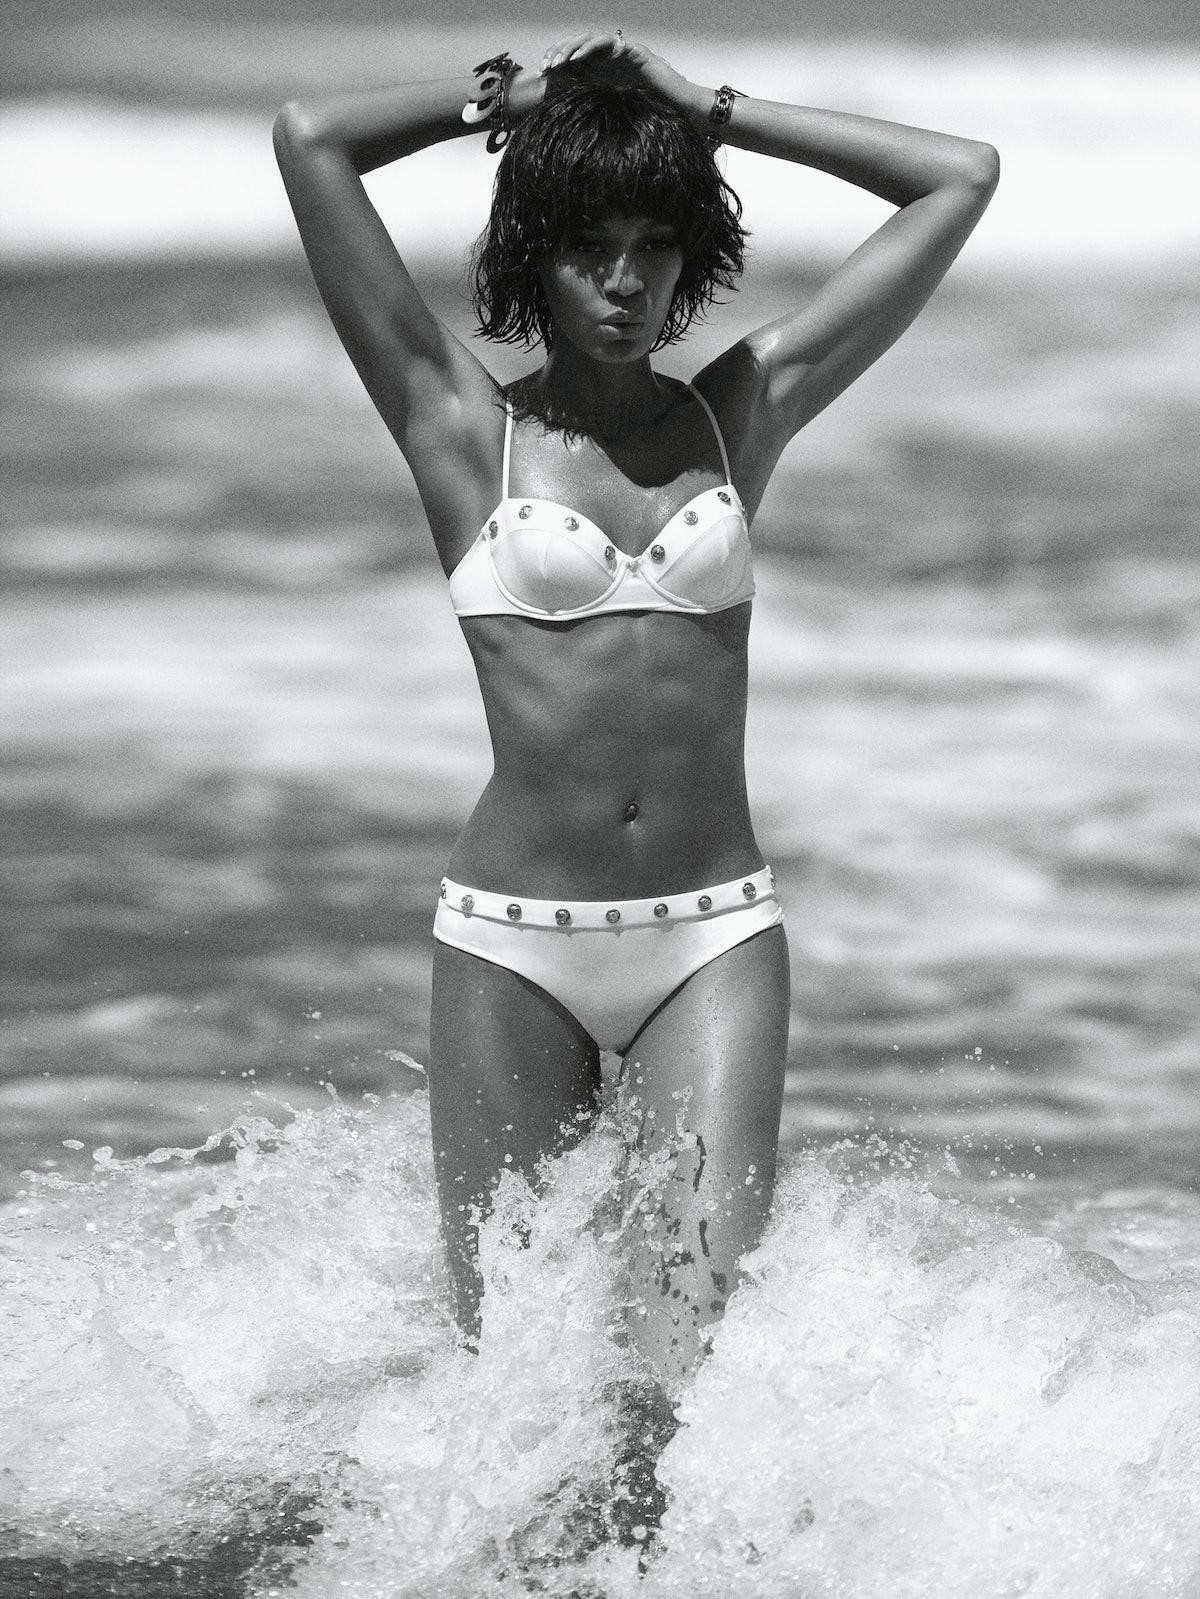 Versace swimsuit. Beauty note: Flaunt a bikini-ready body with Soap & Glory Sit Tight Intense XS Body Firming Serum.